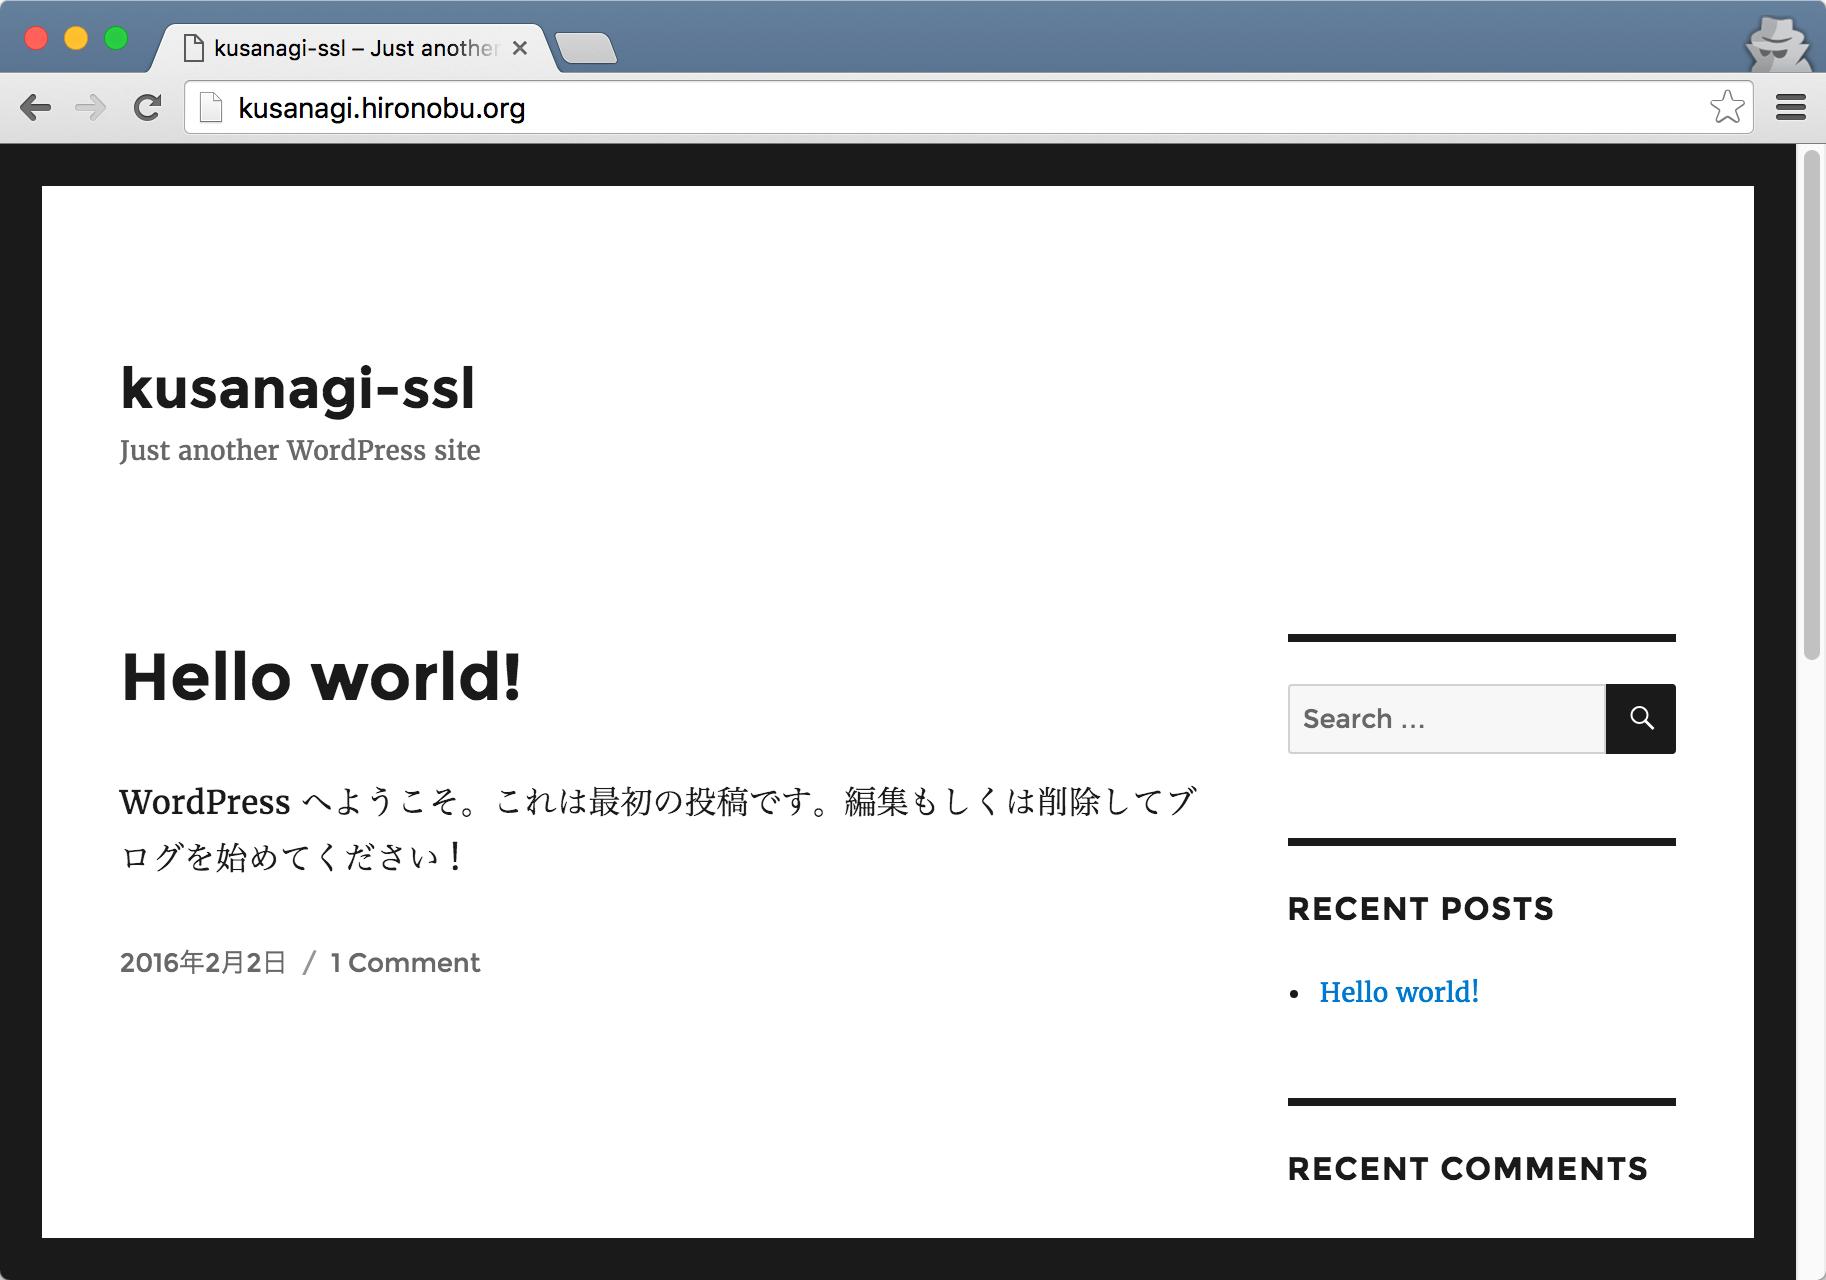 kusanagi-ssl_–_Just_another_WordPress_site.png